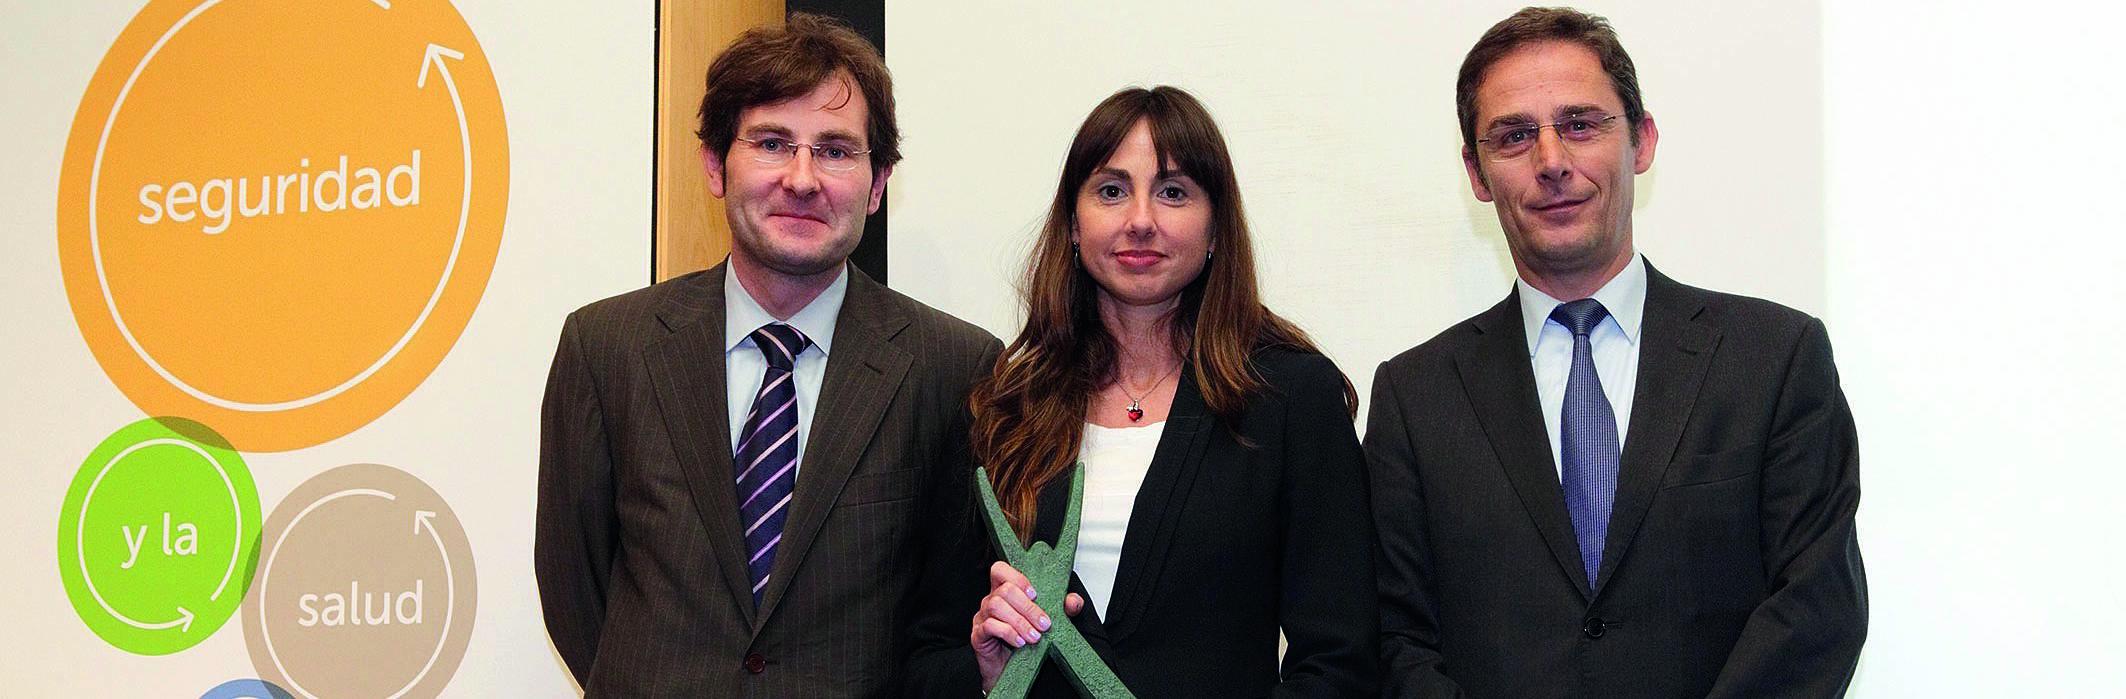 People holding healt programme award